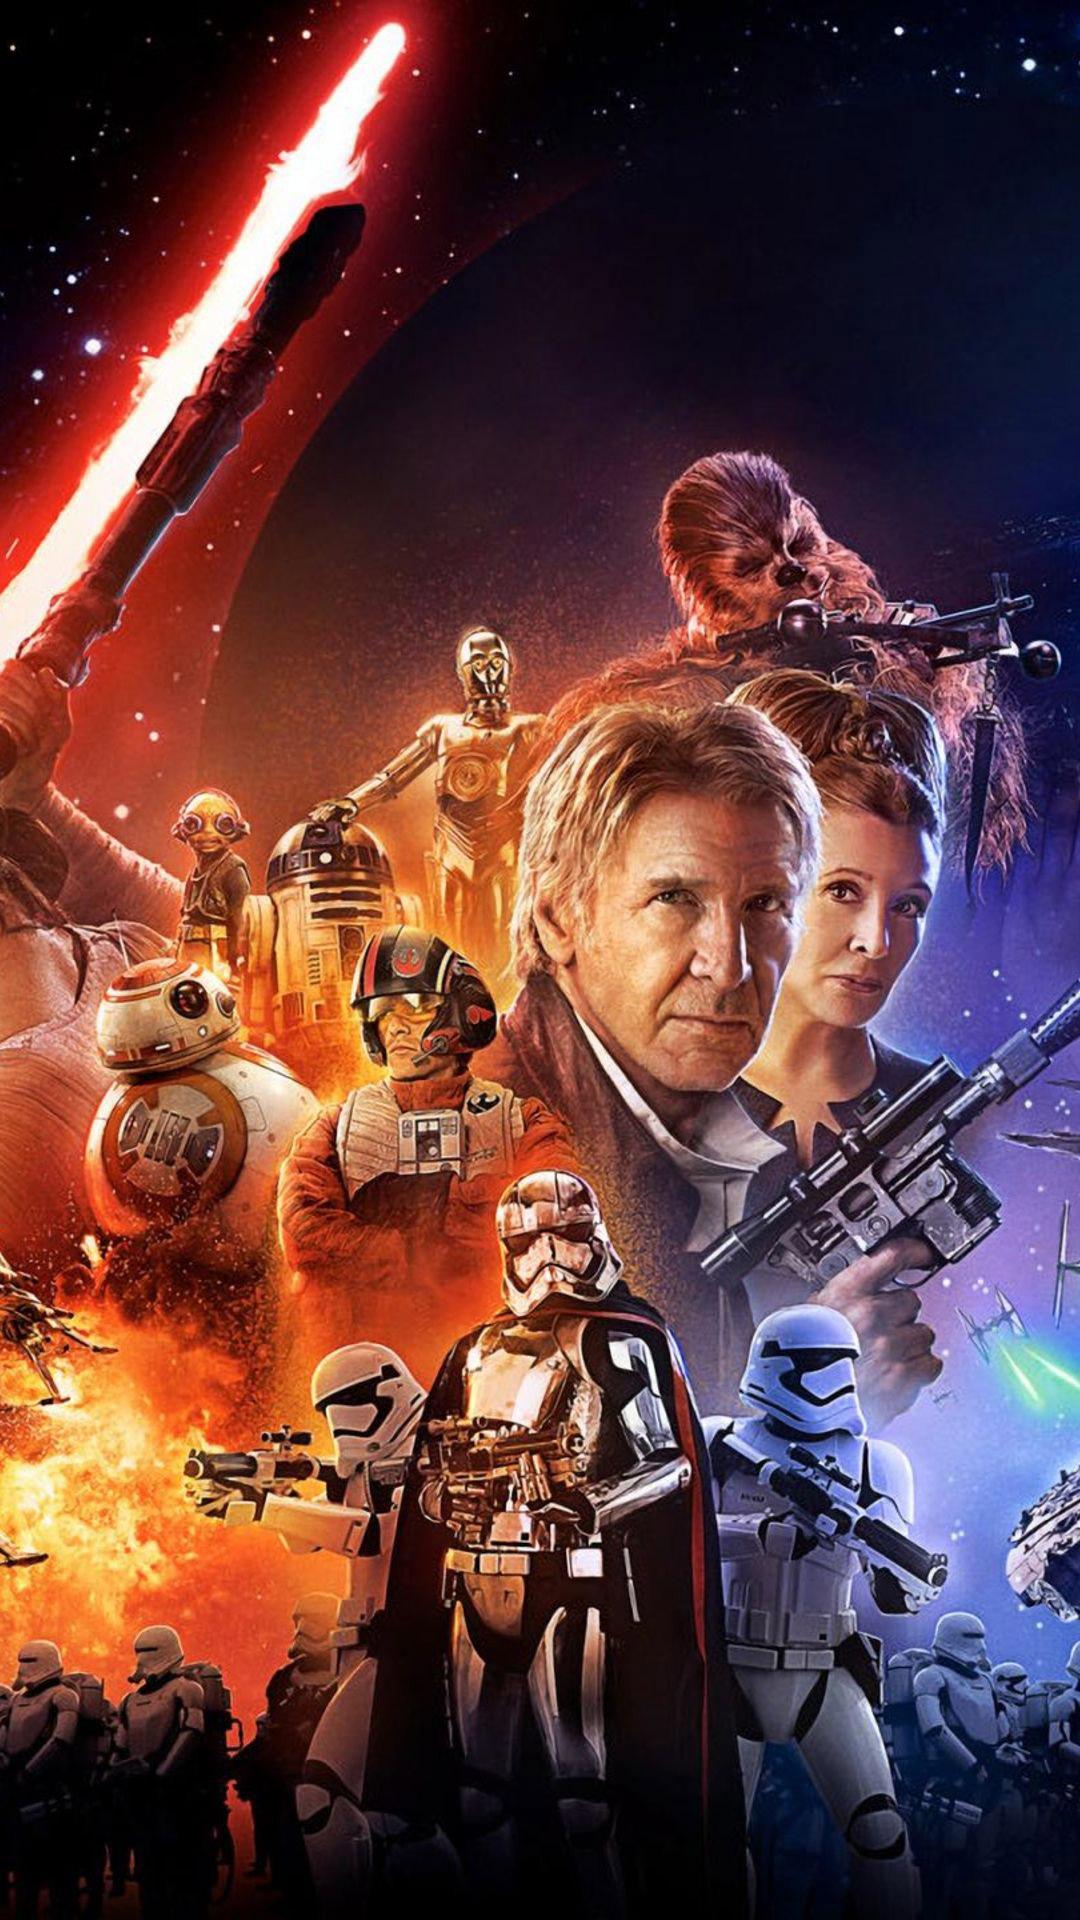 Star-Wars-The-Force-Awakens-Wallpaper-iDownloadBlog-Movie-Poster-Mod